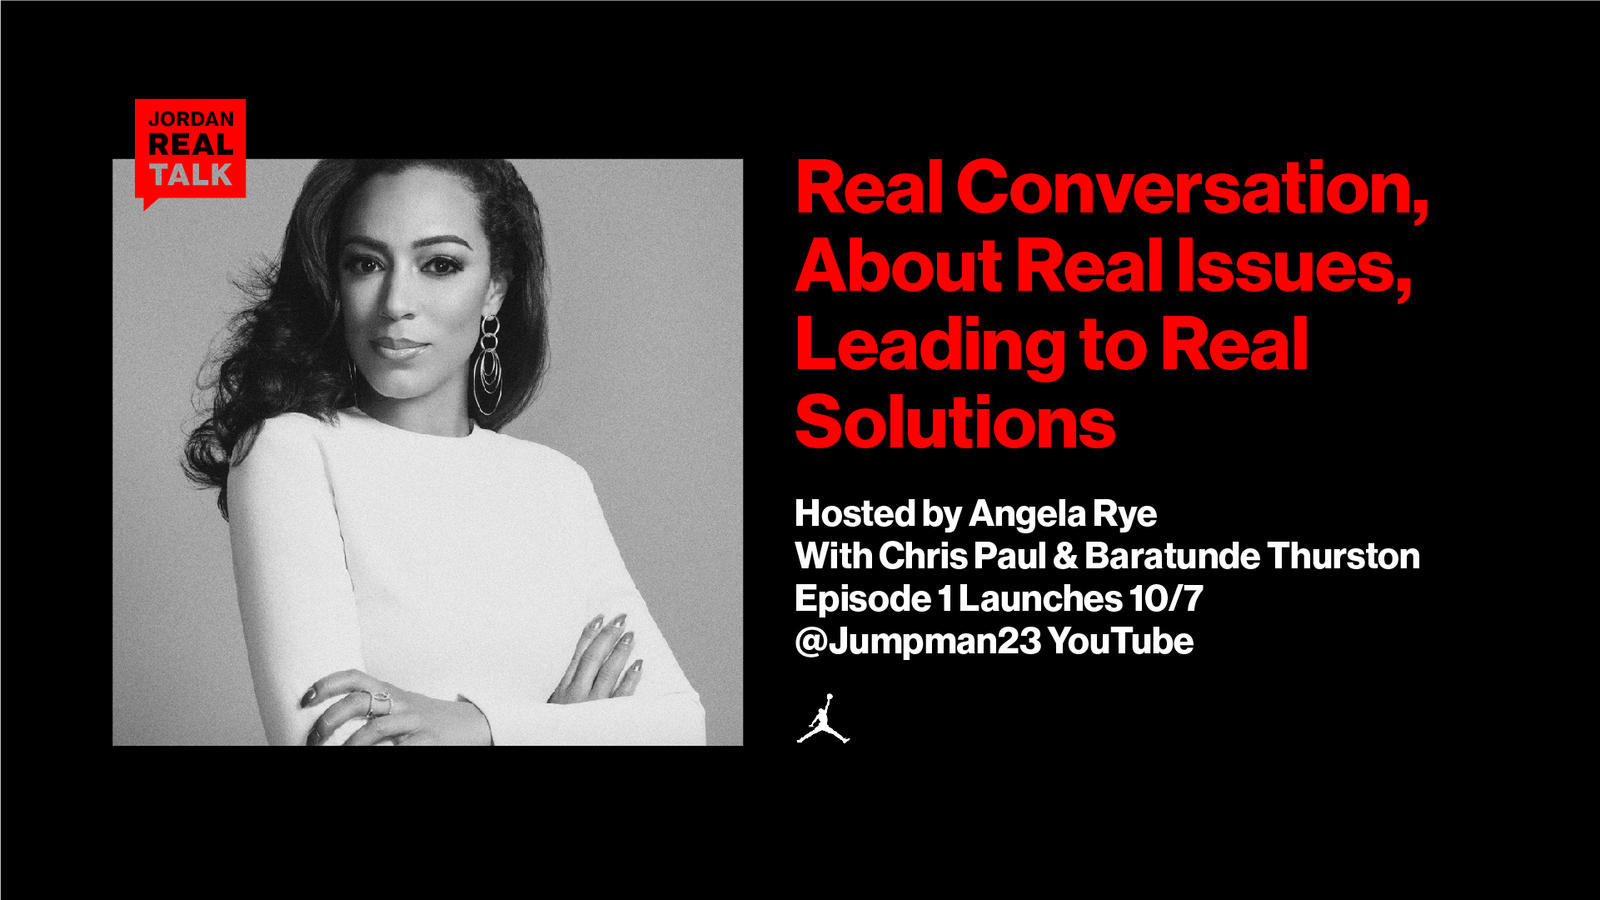 Angela Rye to Host Jordan Brand's 'REAL TALK' Series Dedicated to Social Issues